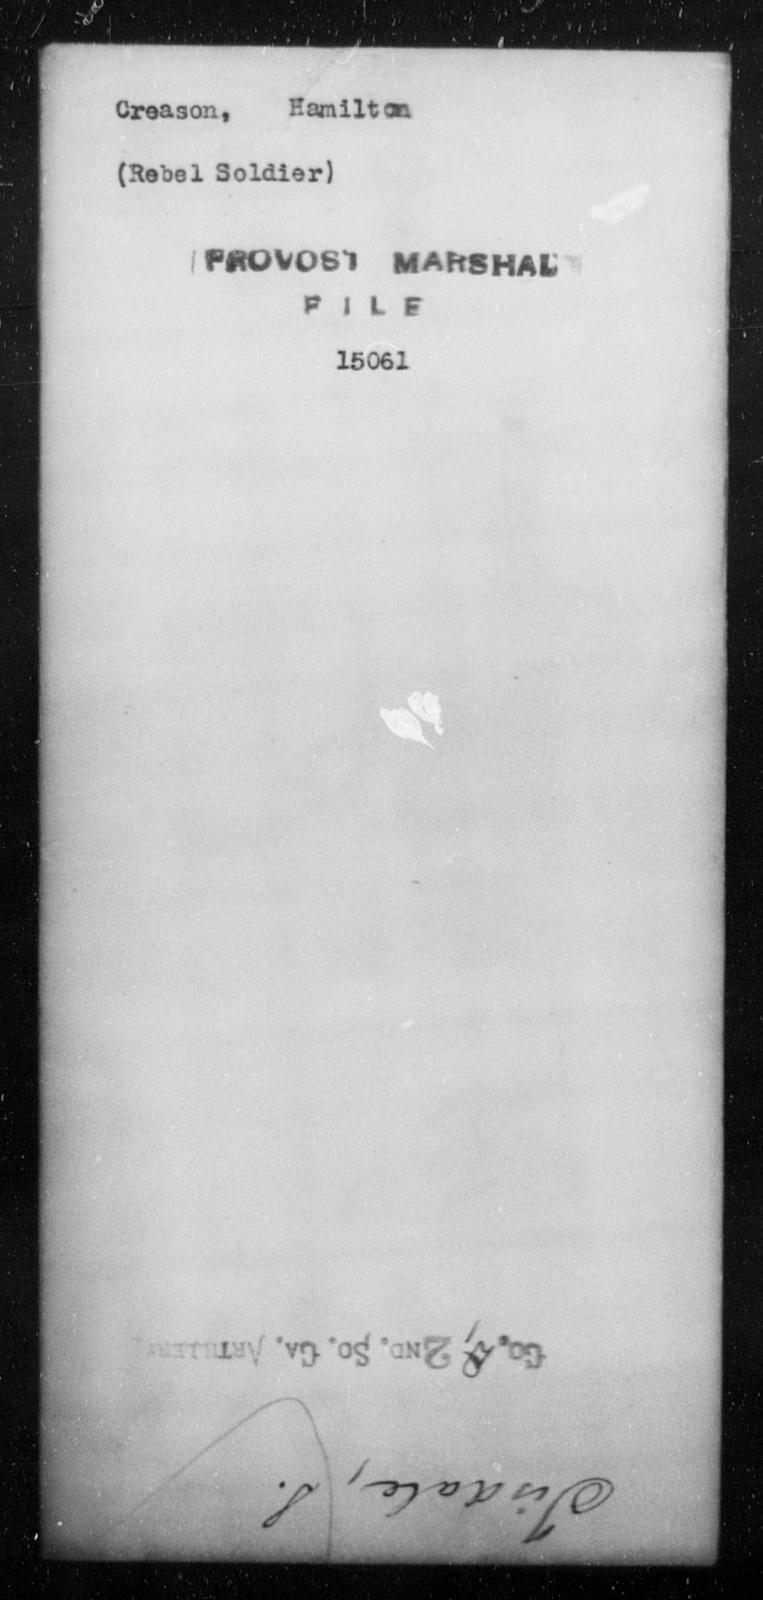 Creason, Hamilton - State: [Blank] - Year: [Blank]